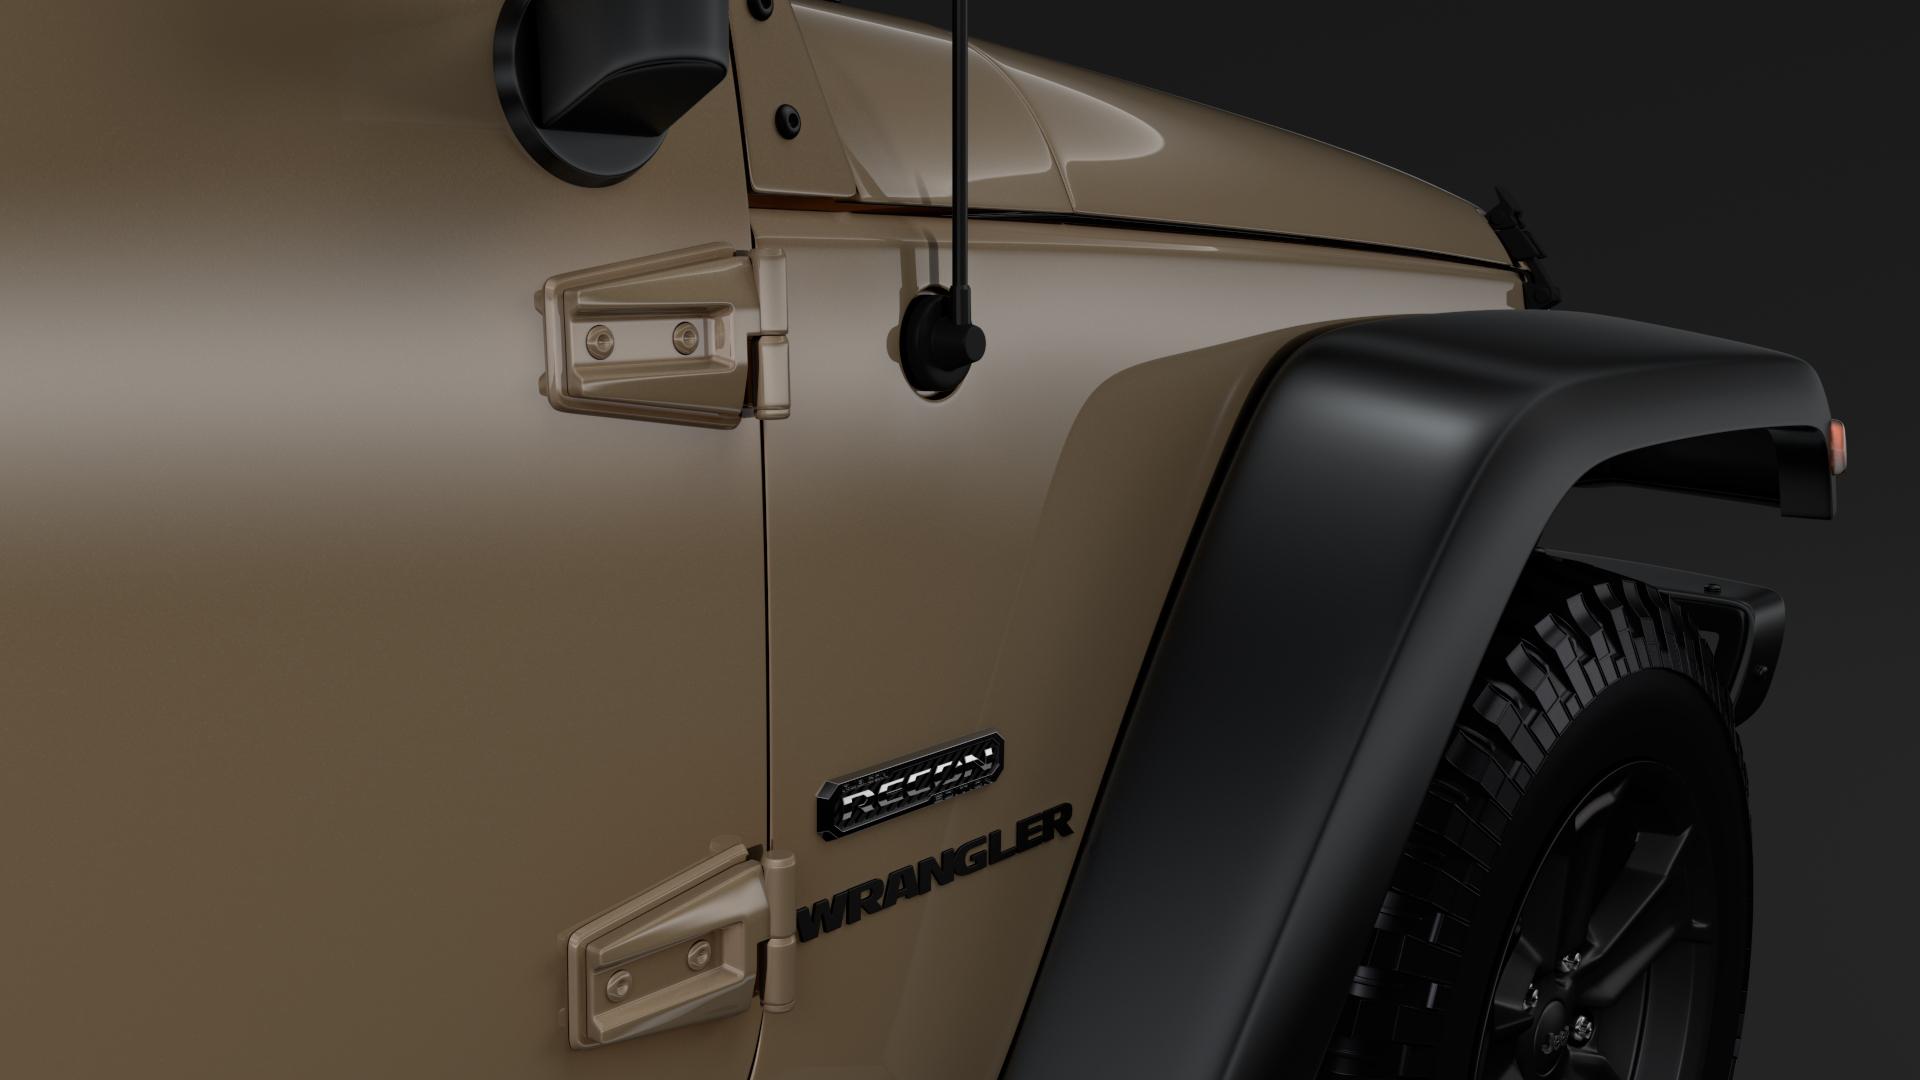 jeep wrangler rubicon recon jk 2017 3d model max fbx lwo ma mb hrc xsi obj 276941